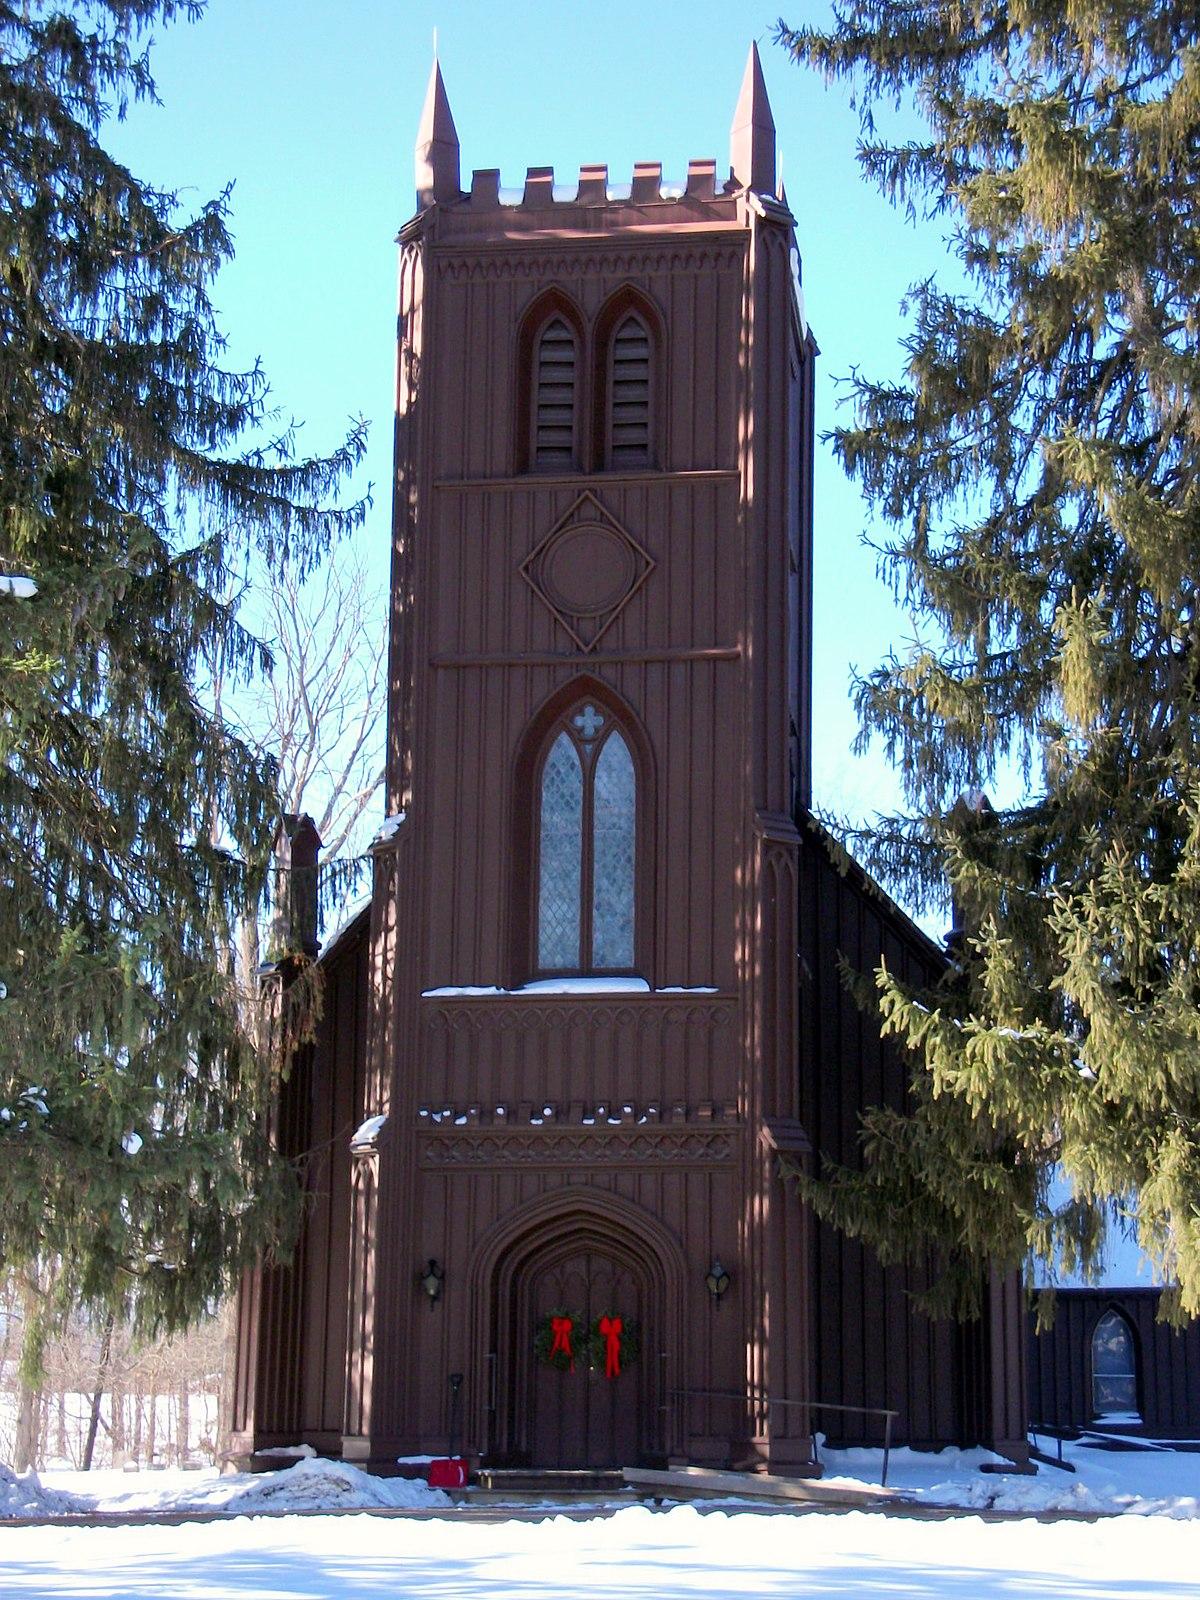 Church Of St John The Evangelist Stockport New York